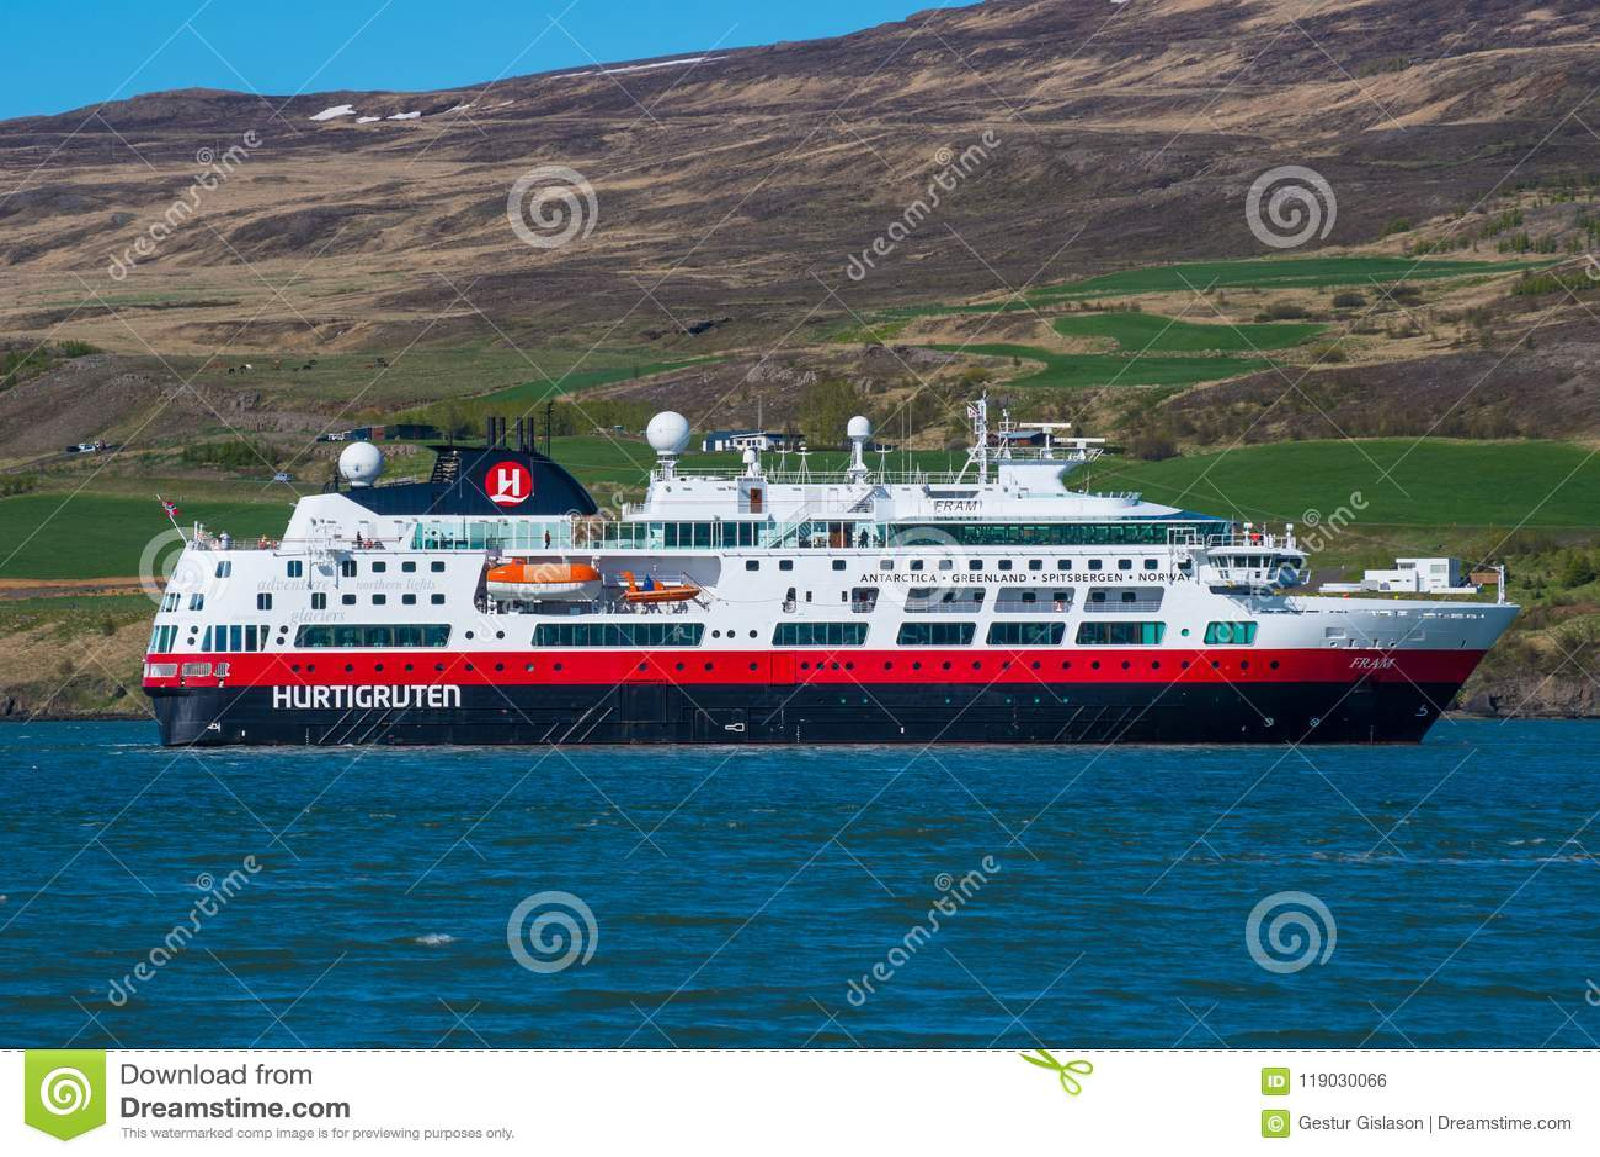 Cruise Ship Fram From The Norwegian Company Hurtigruten In